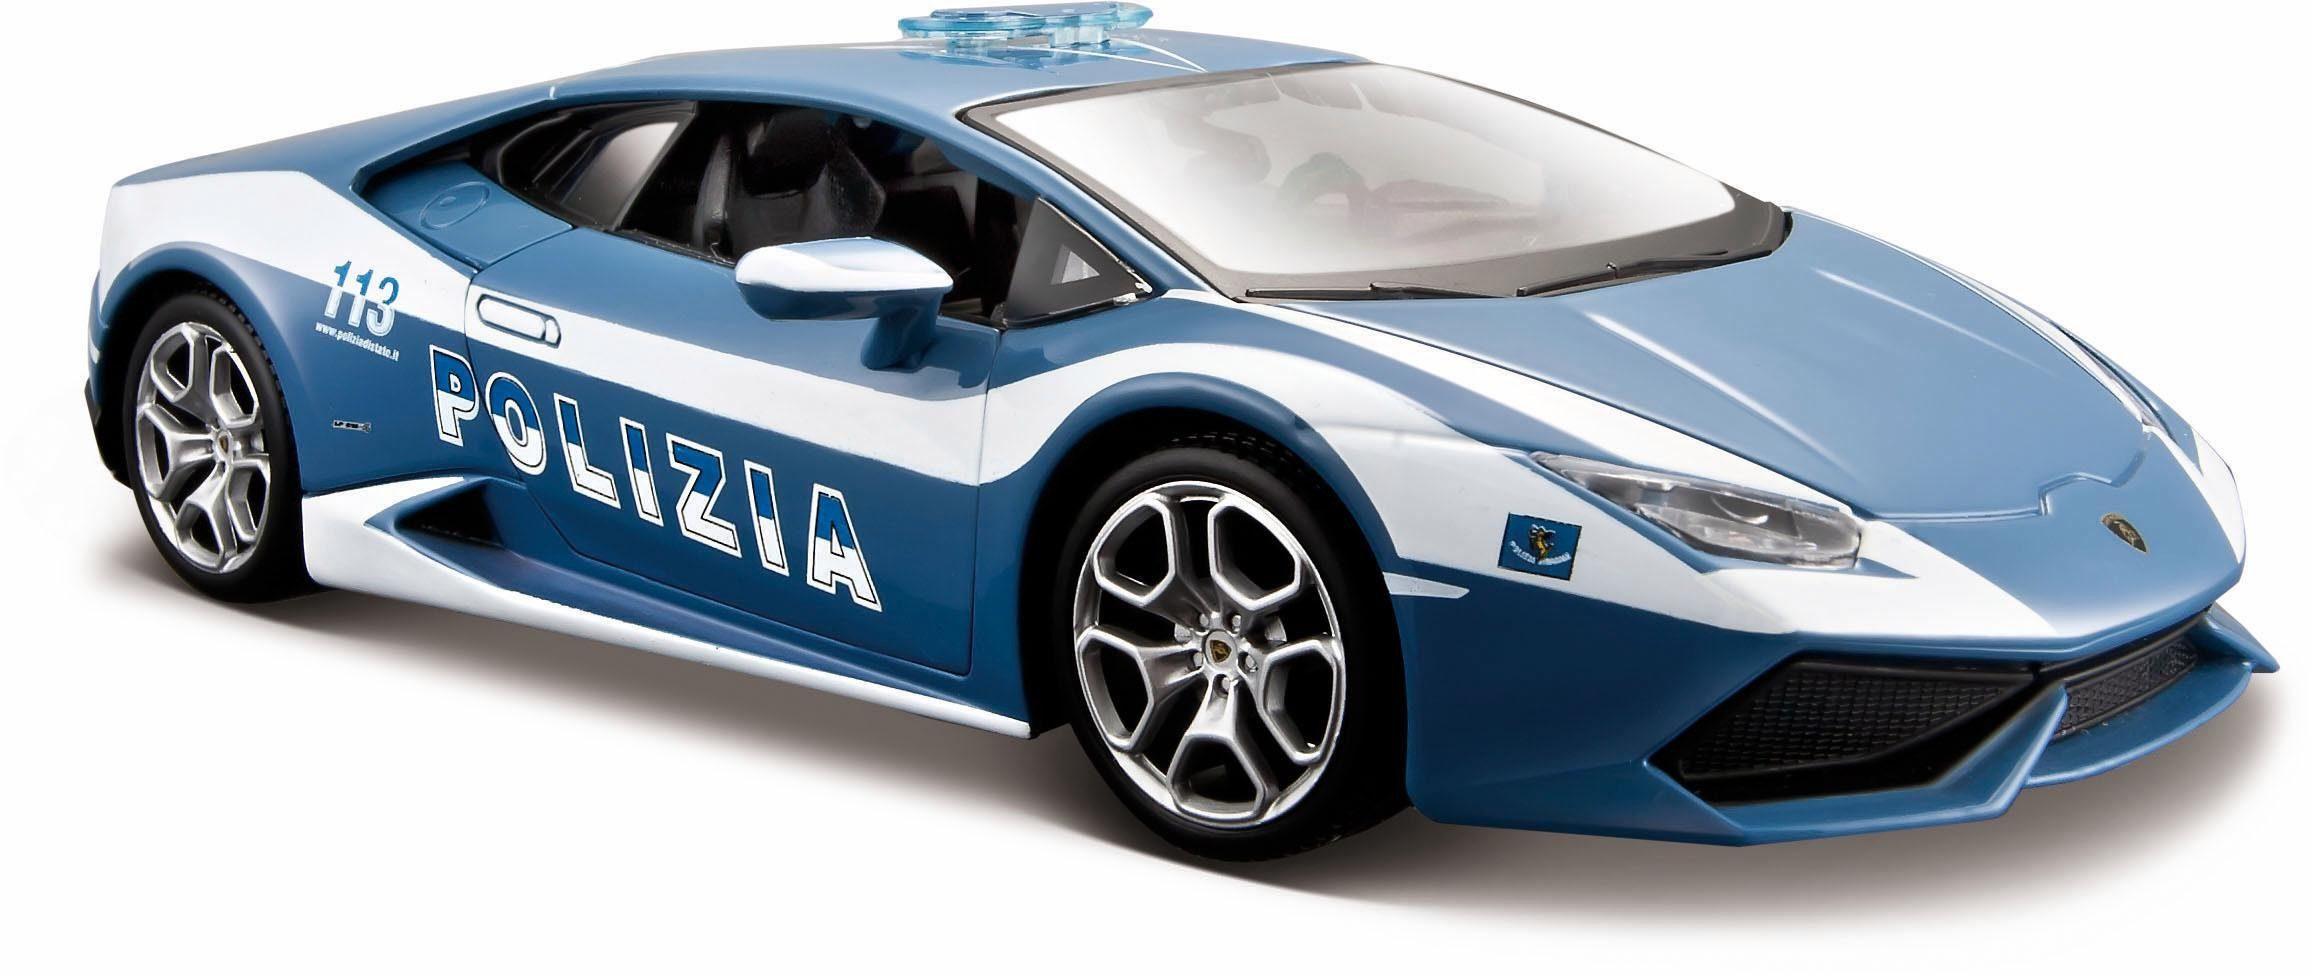 Maisto® Sammlerauto, »Lamborghini Huracan LP610-4 Policia, 1:24«